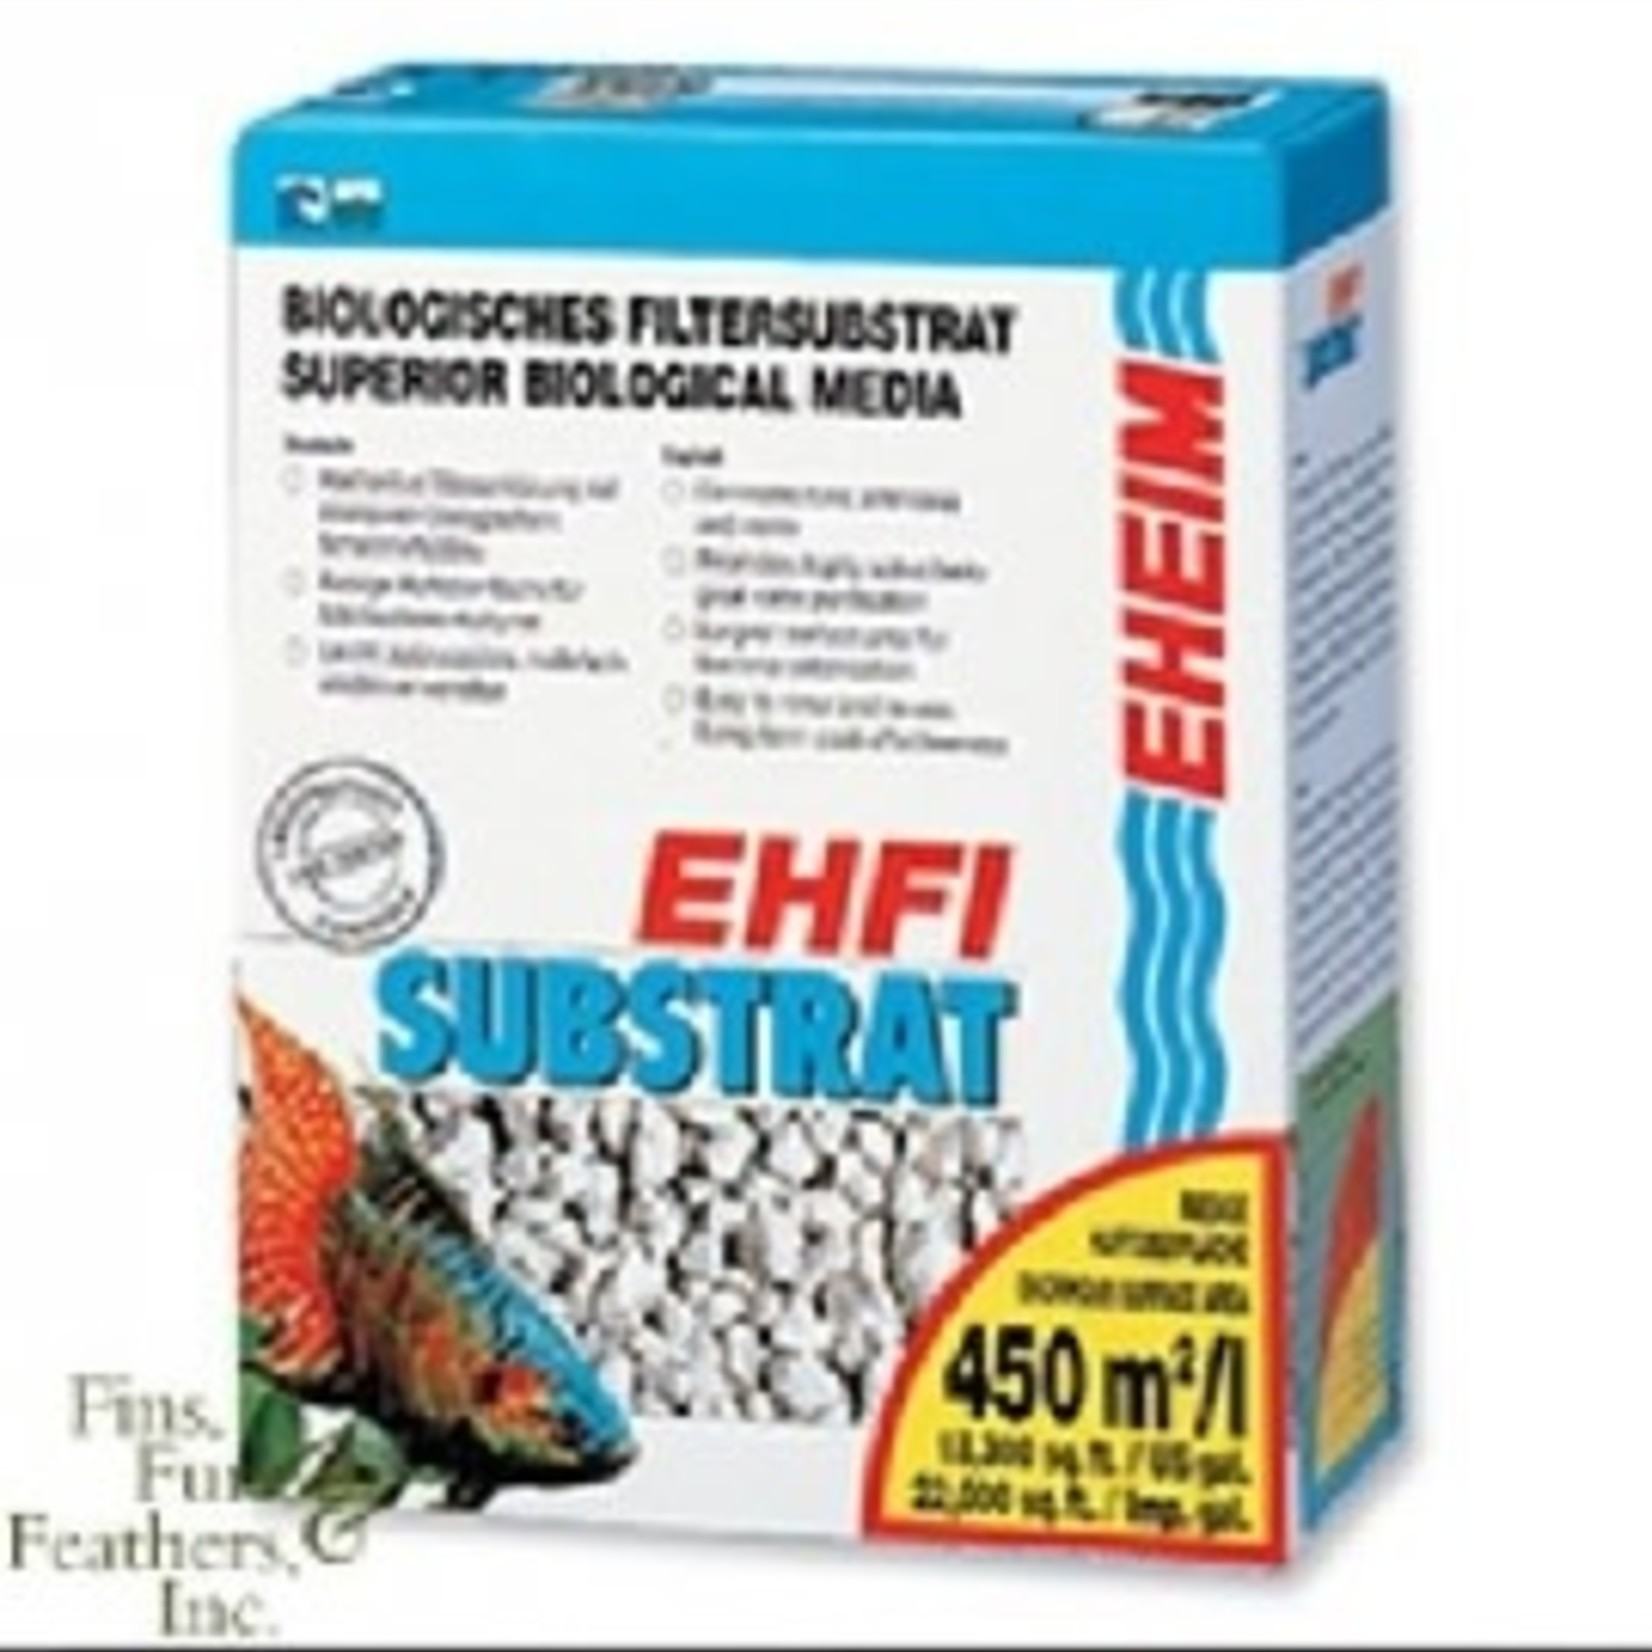 Eheim EHFISUBSTRAT